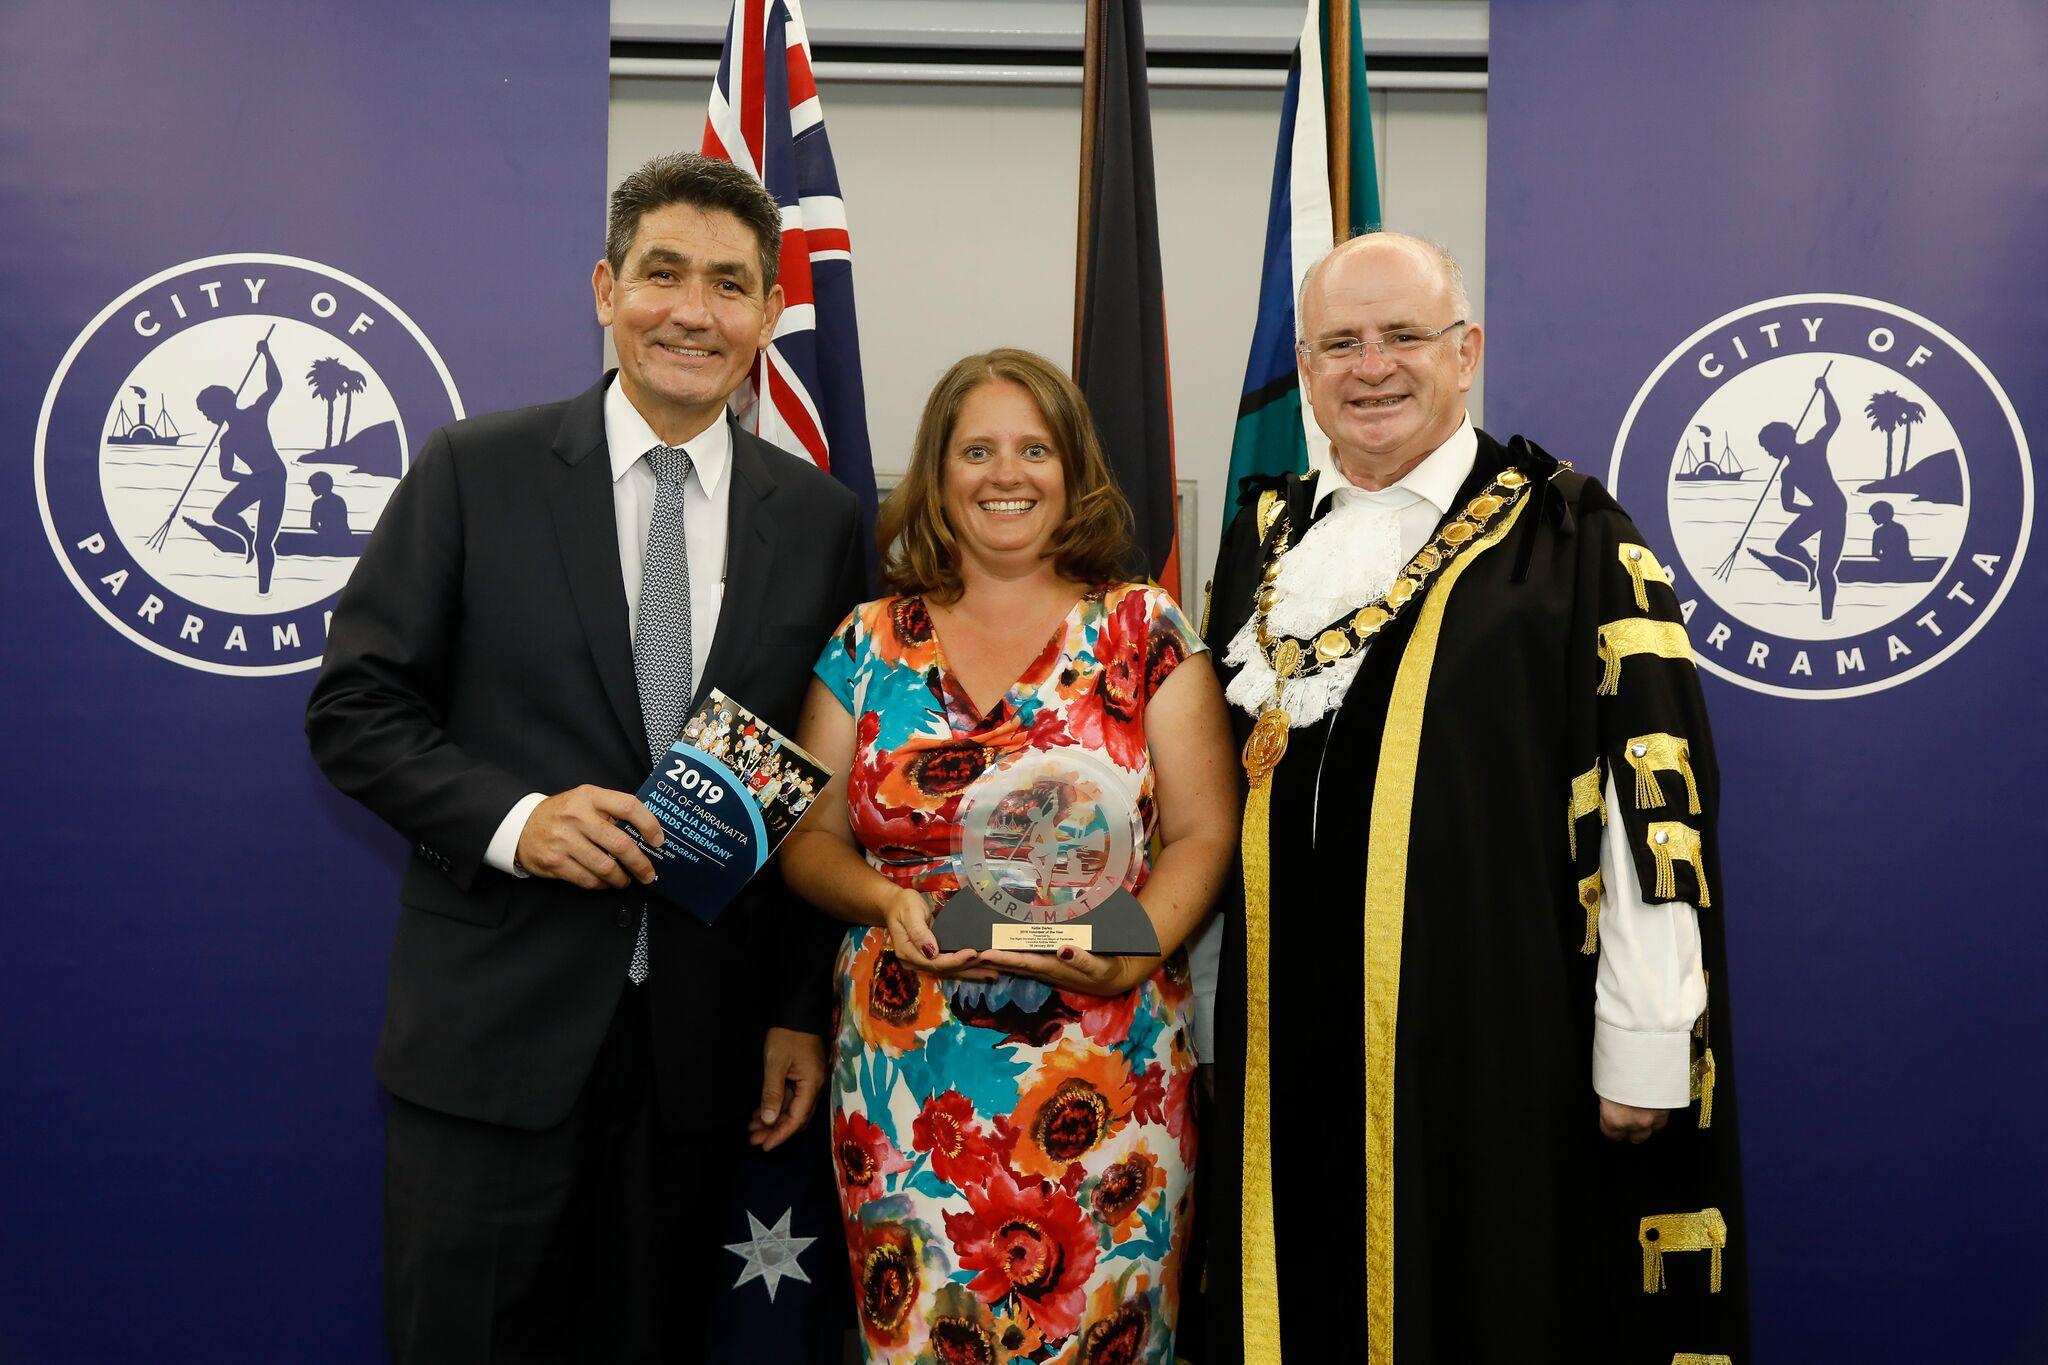 Australia Day Awards City of Parramatta